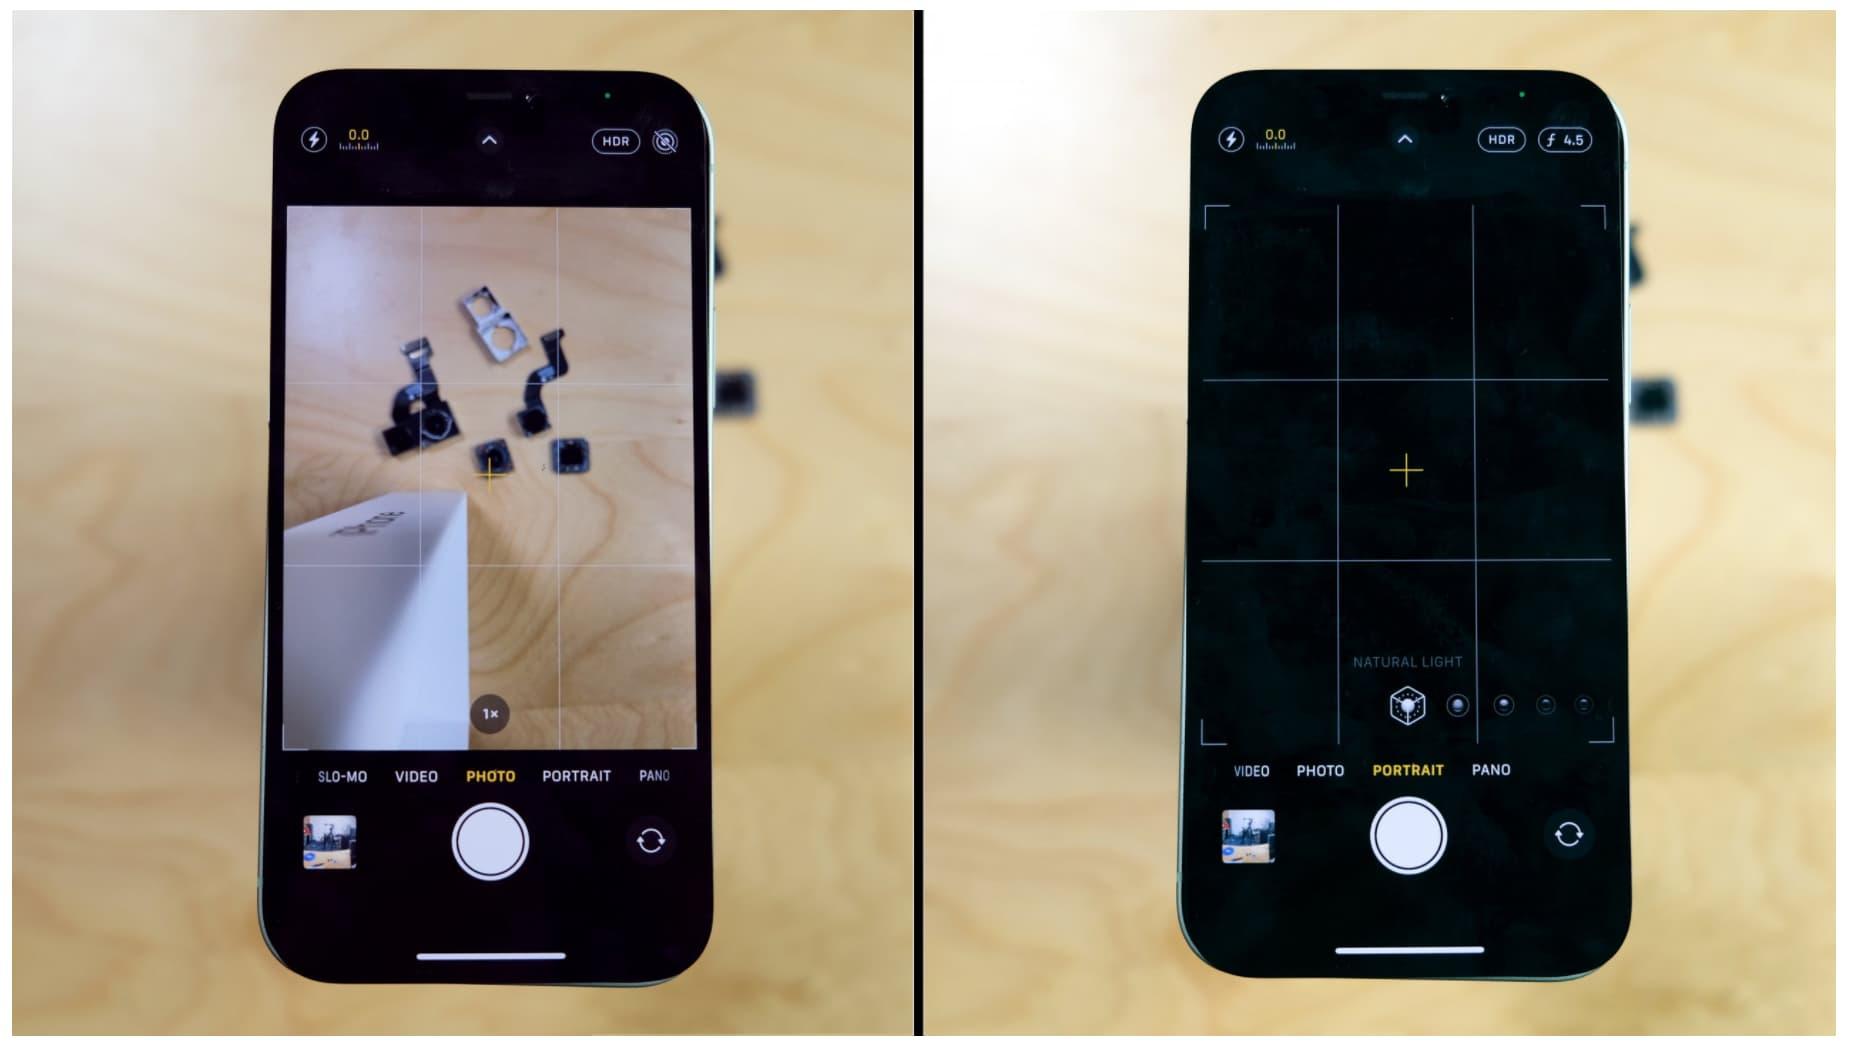 iFixit 證實 iPhone 12 鏡頭、螢幕維修 需原廠才能更換